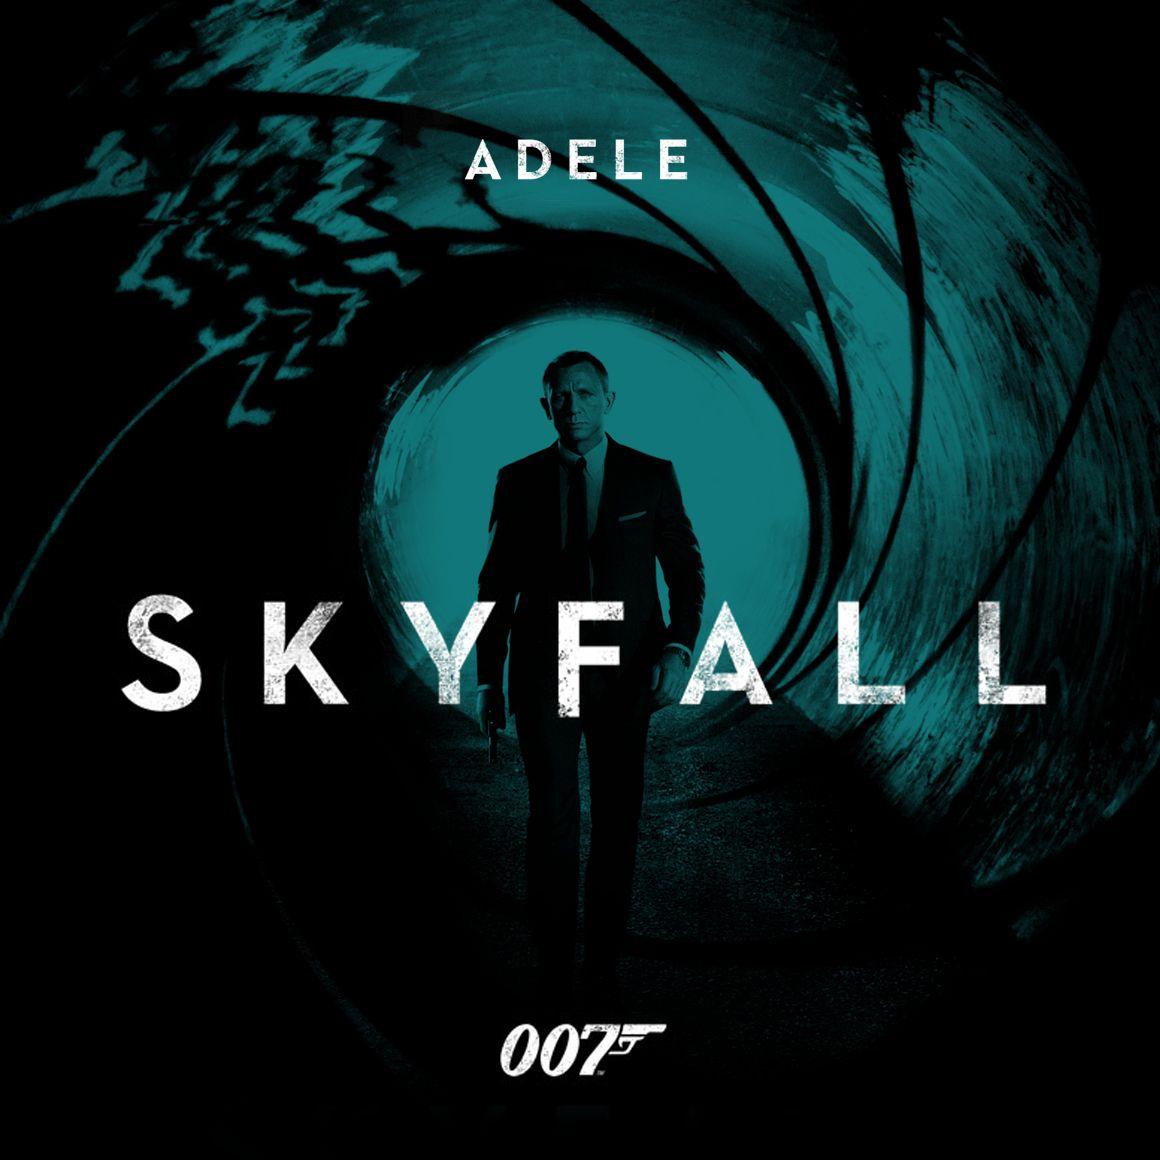 Adele – Skyfall (Studio Acapella) | Studio Acapellas in 2019